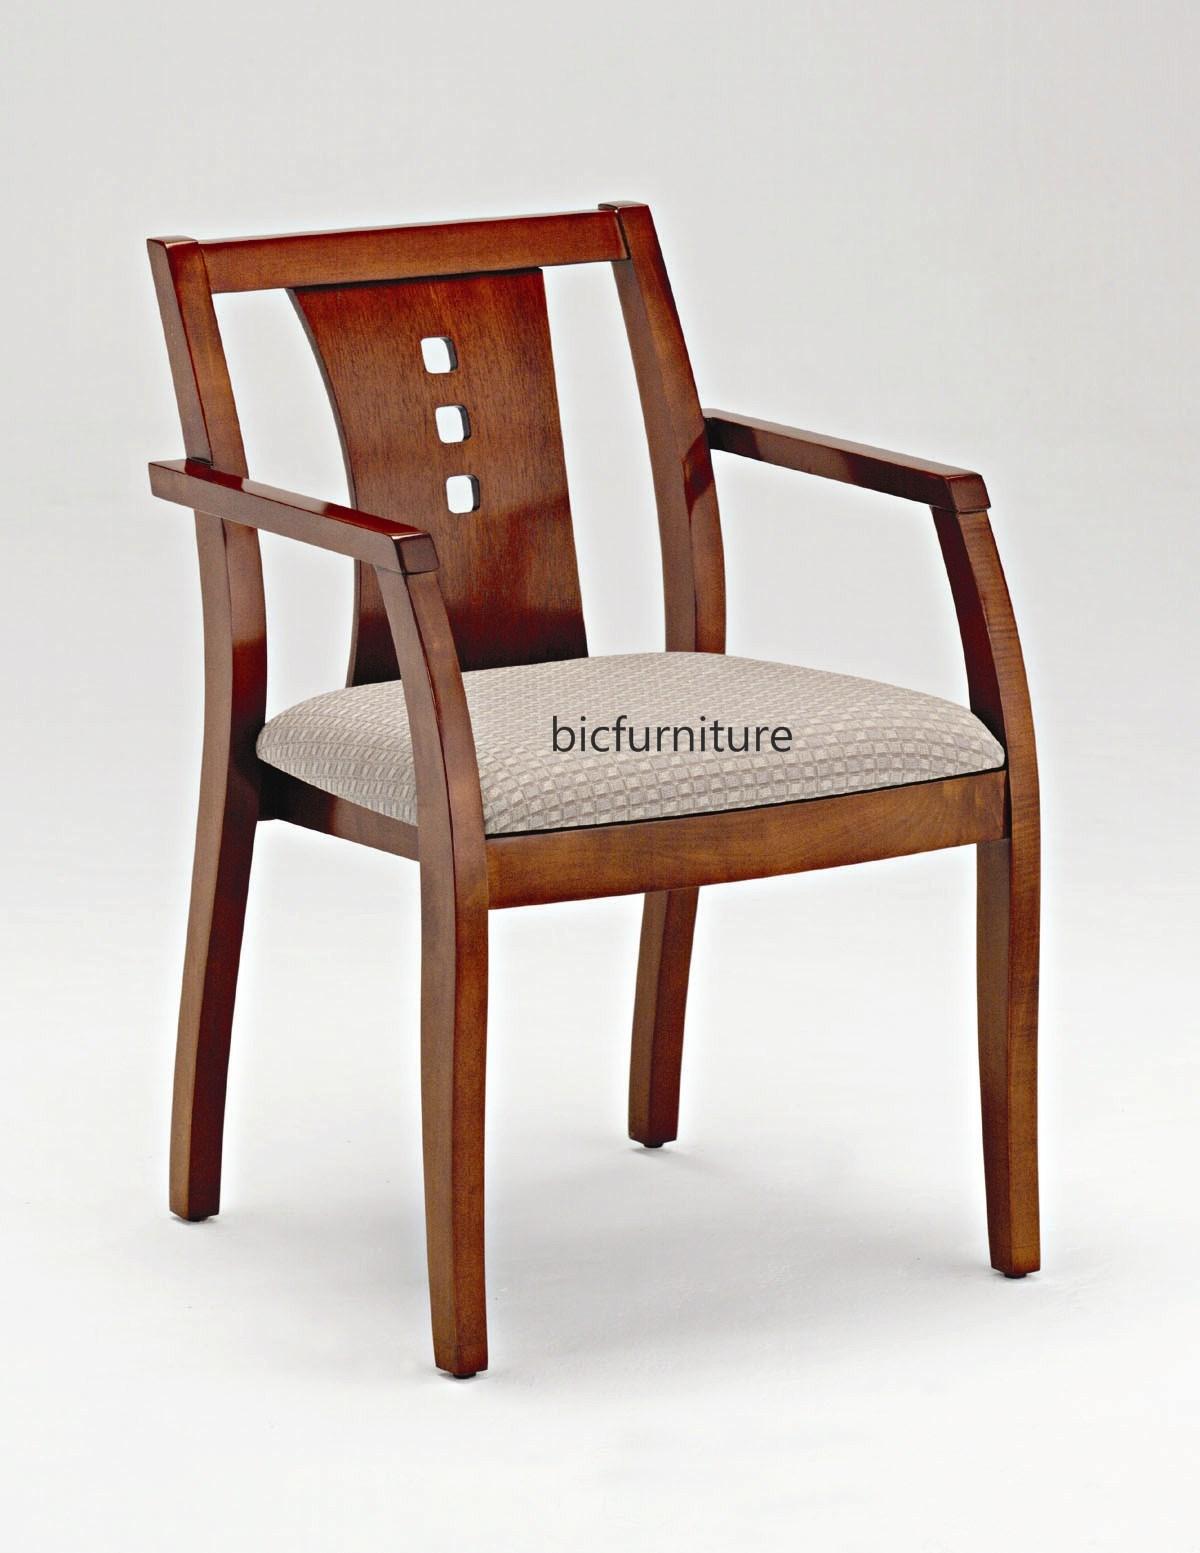 Bic muebles muebles de madera de teca madera sheesham - Muebles bombay ...